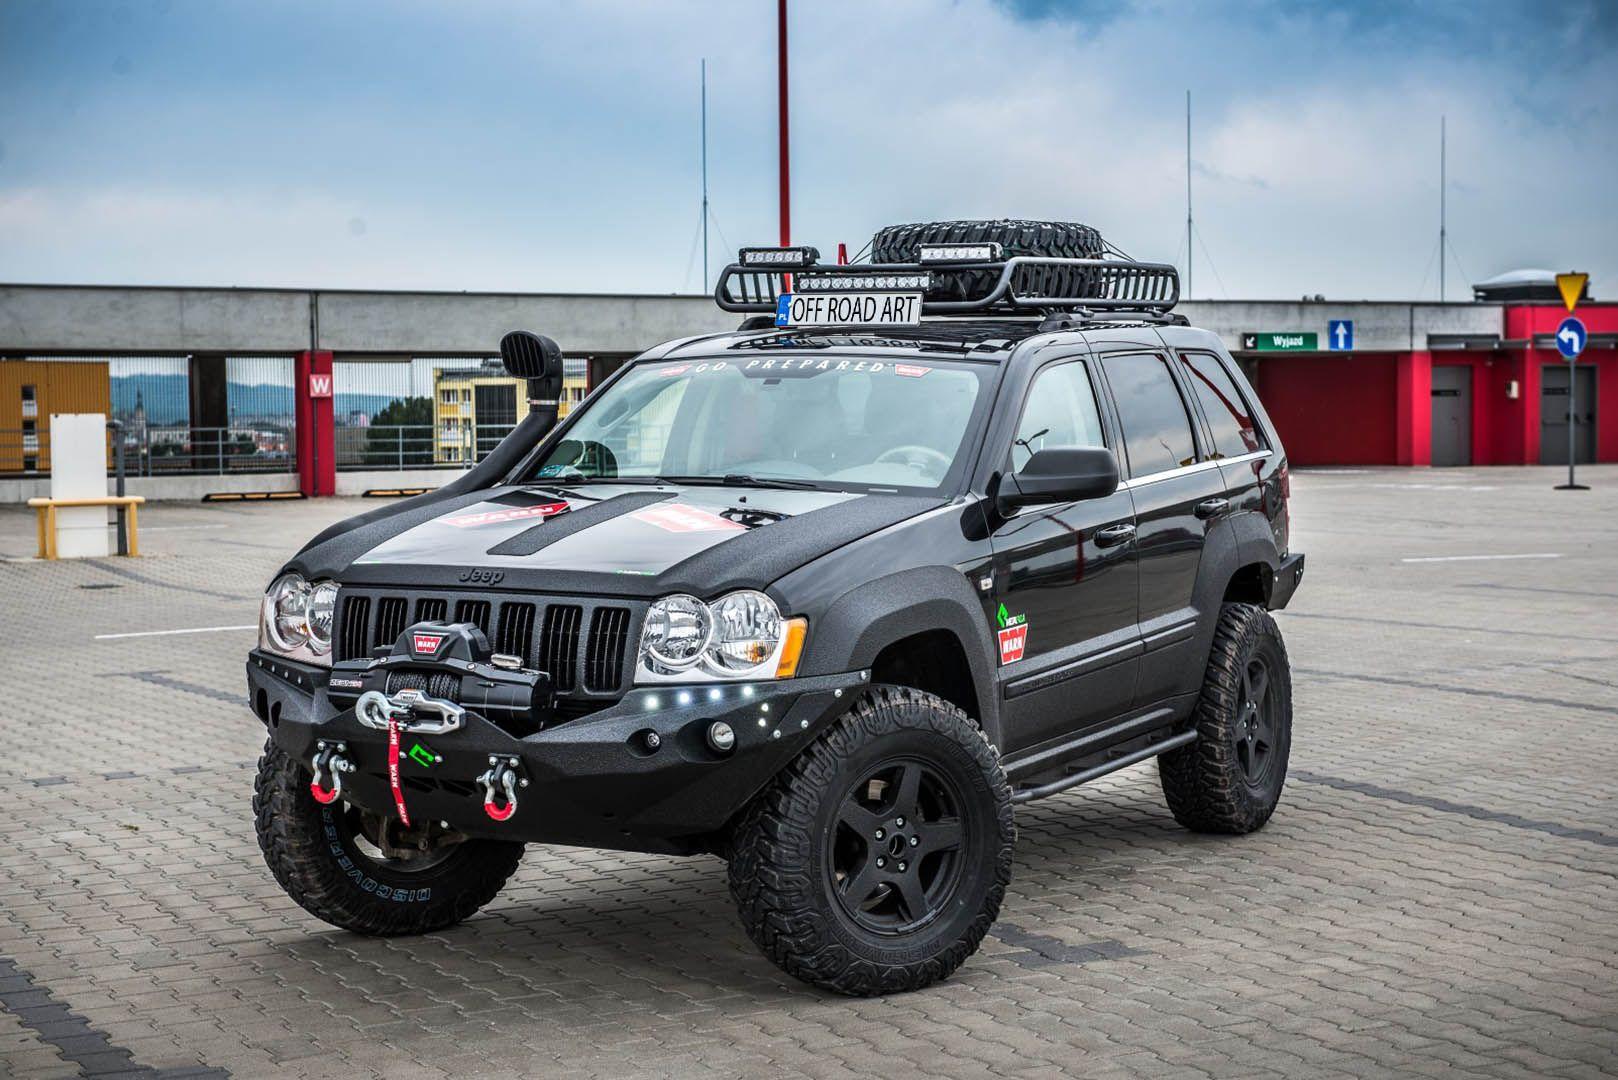 Jeep Grand Cherokee Off Road >> Metalpasja Innowacyjne Doposazenia Offroad Jeep Grand